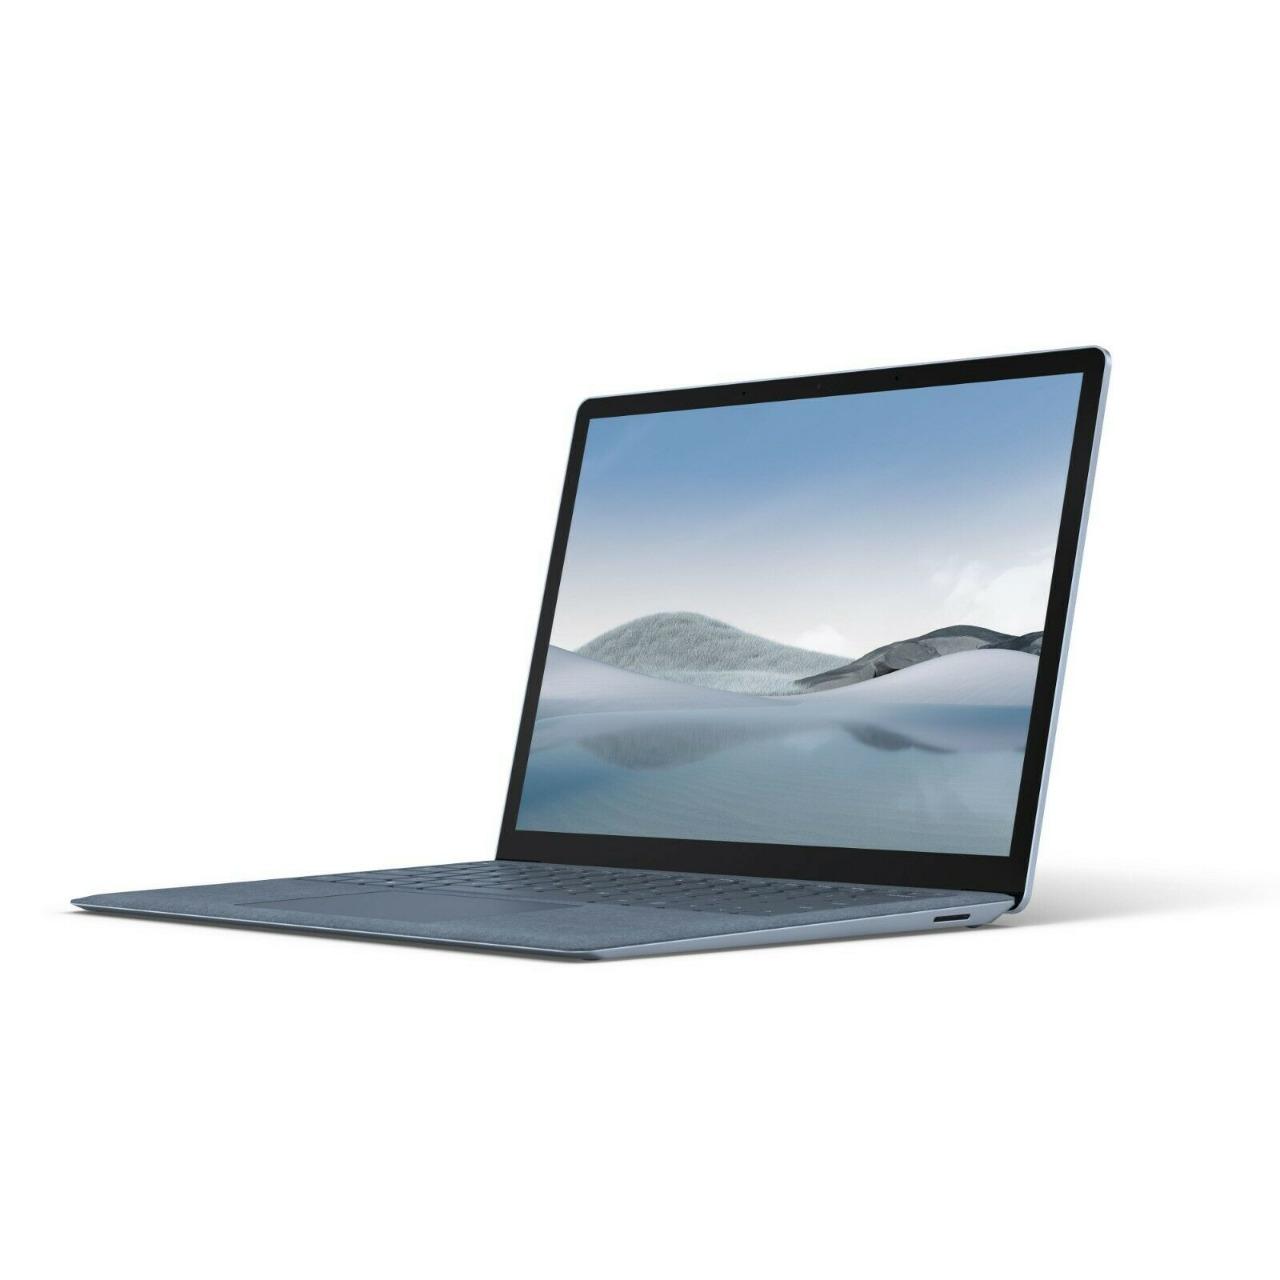 Microsoft Surface laptop 4 13.5 core i5 16gb 512gb Ice Blue